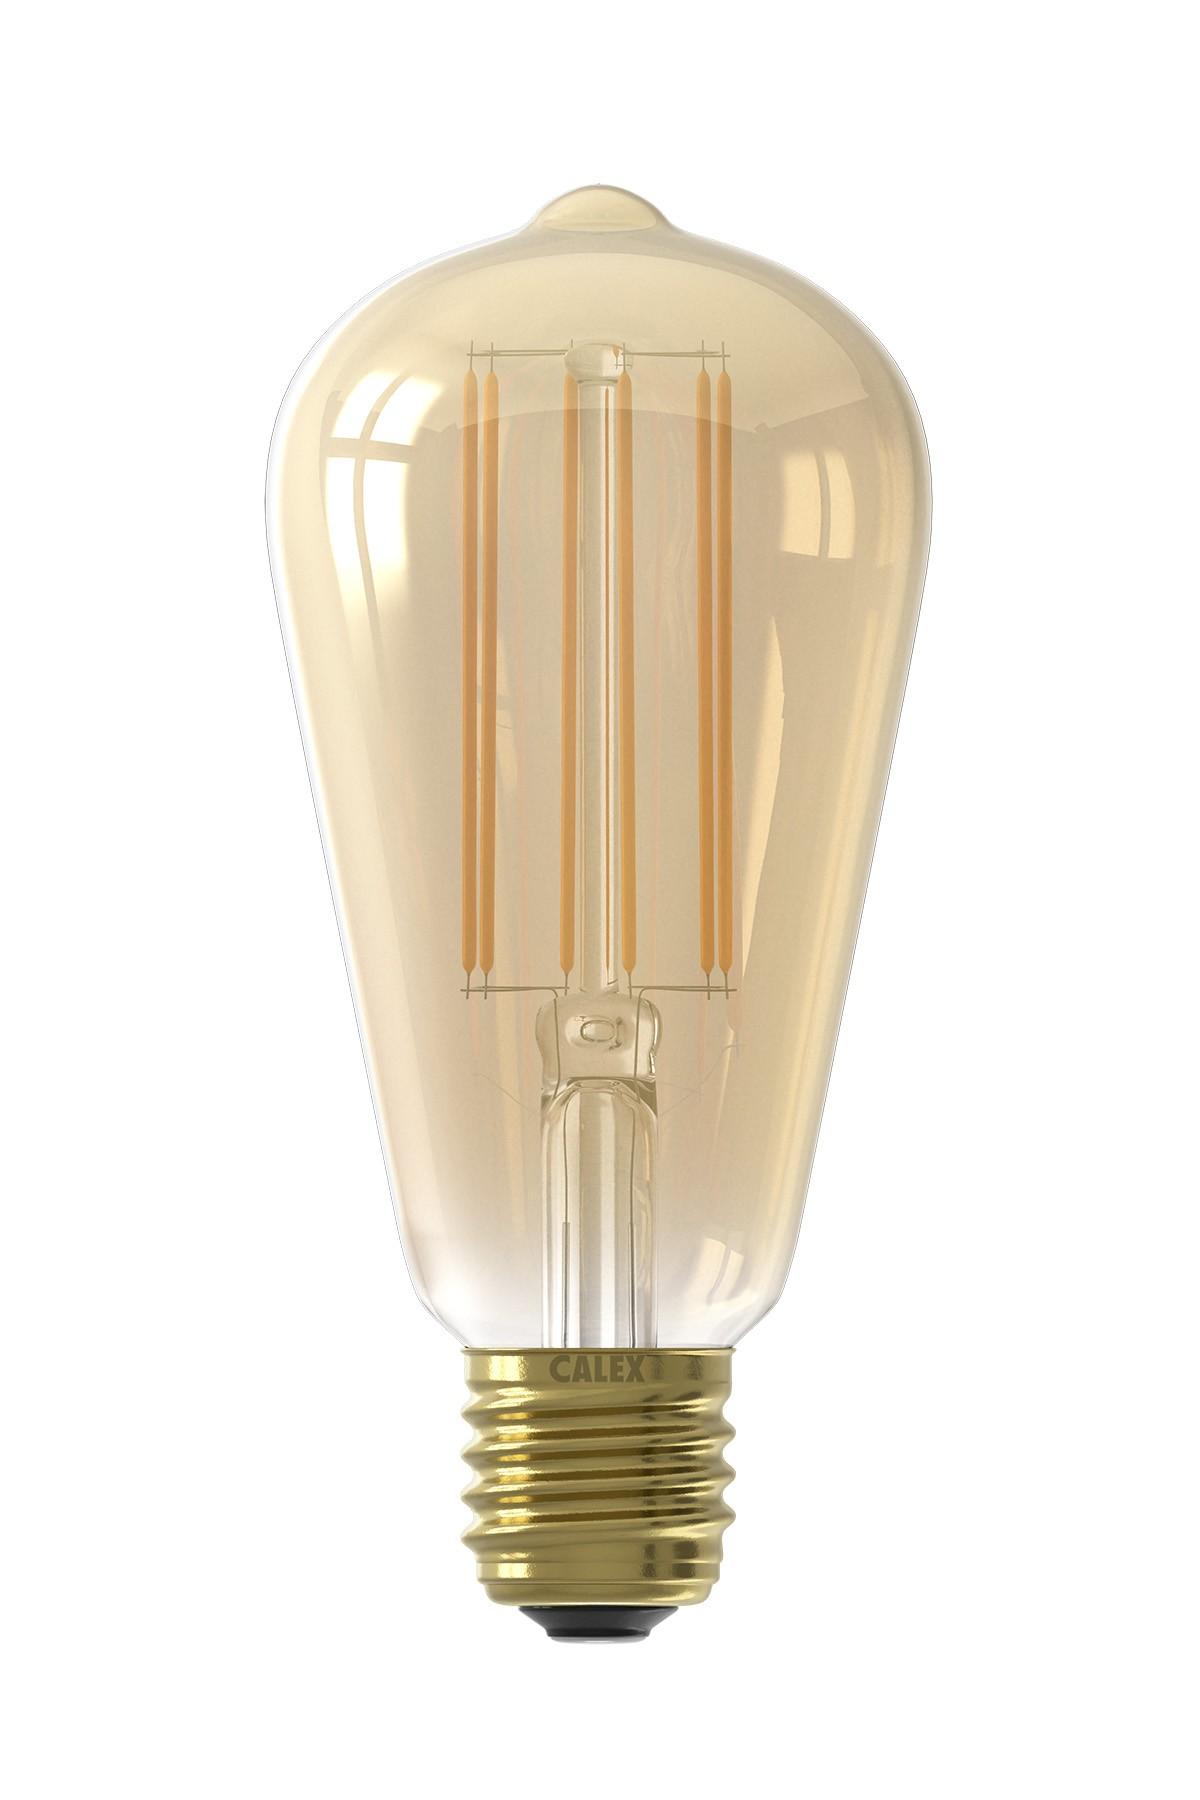 Calex LED volglas LangFilament Rustieklamp 240V 4W 400lm E27 ST64, Goud 2100K met sensor